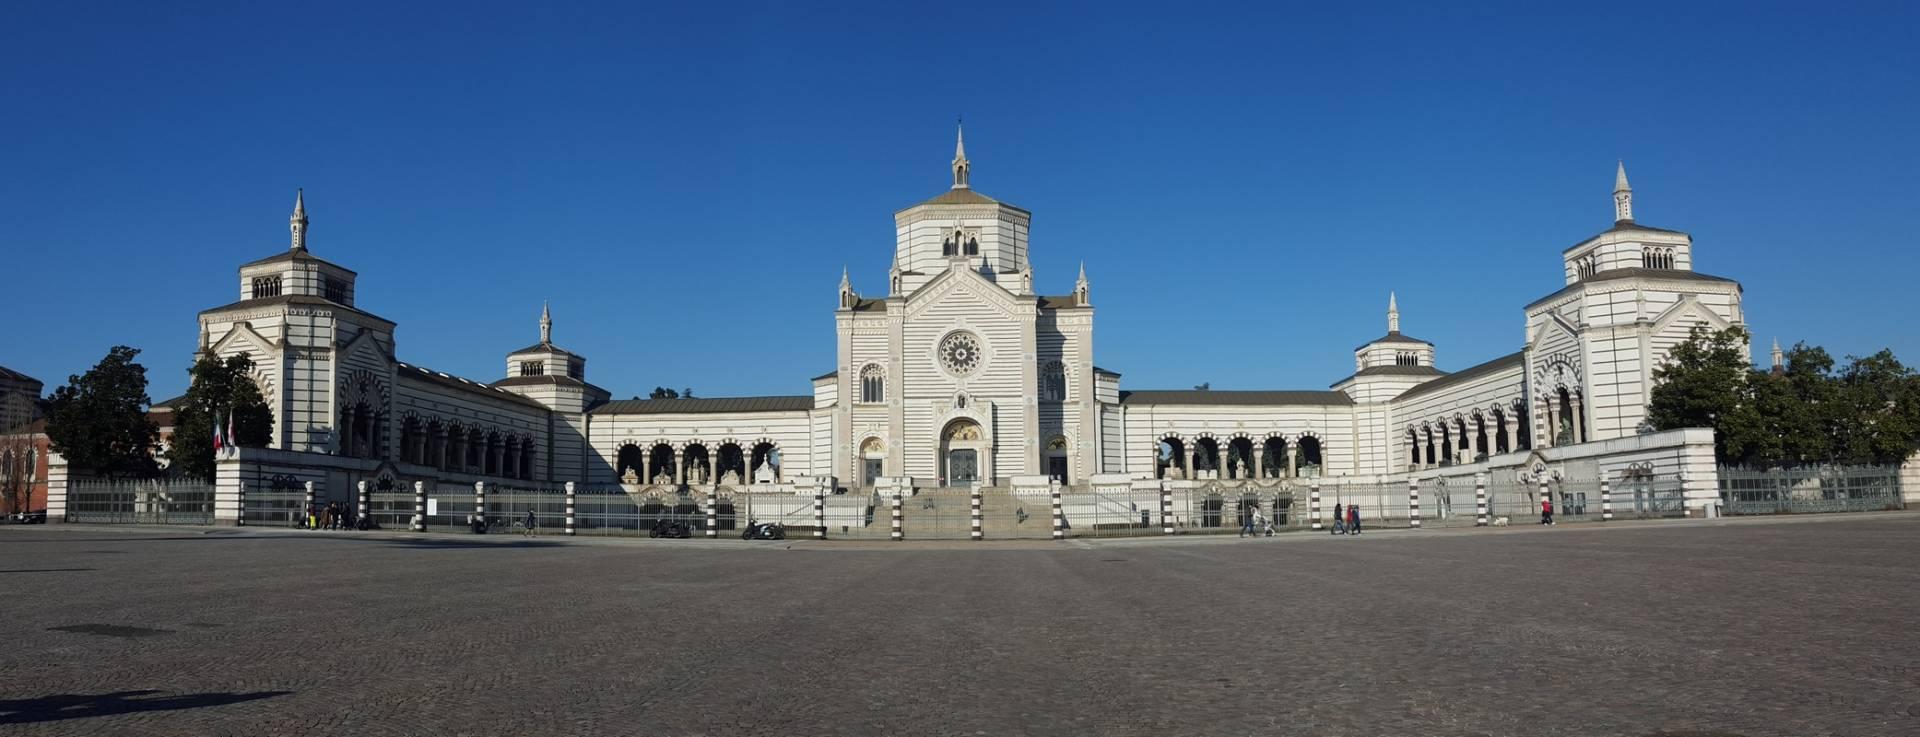 cimetiere monumental milan